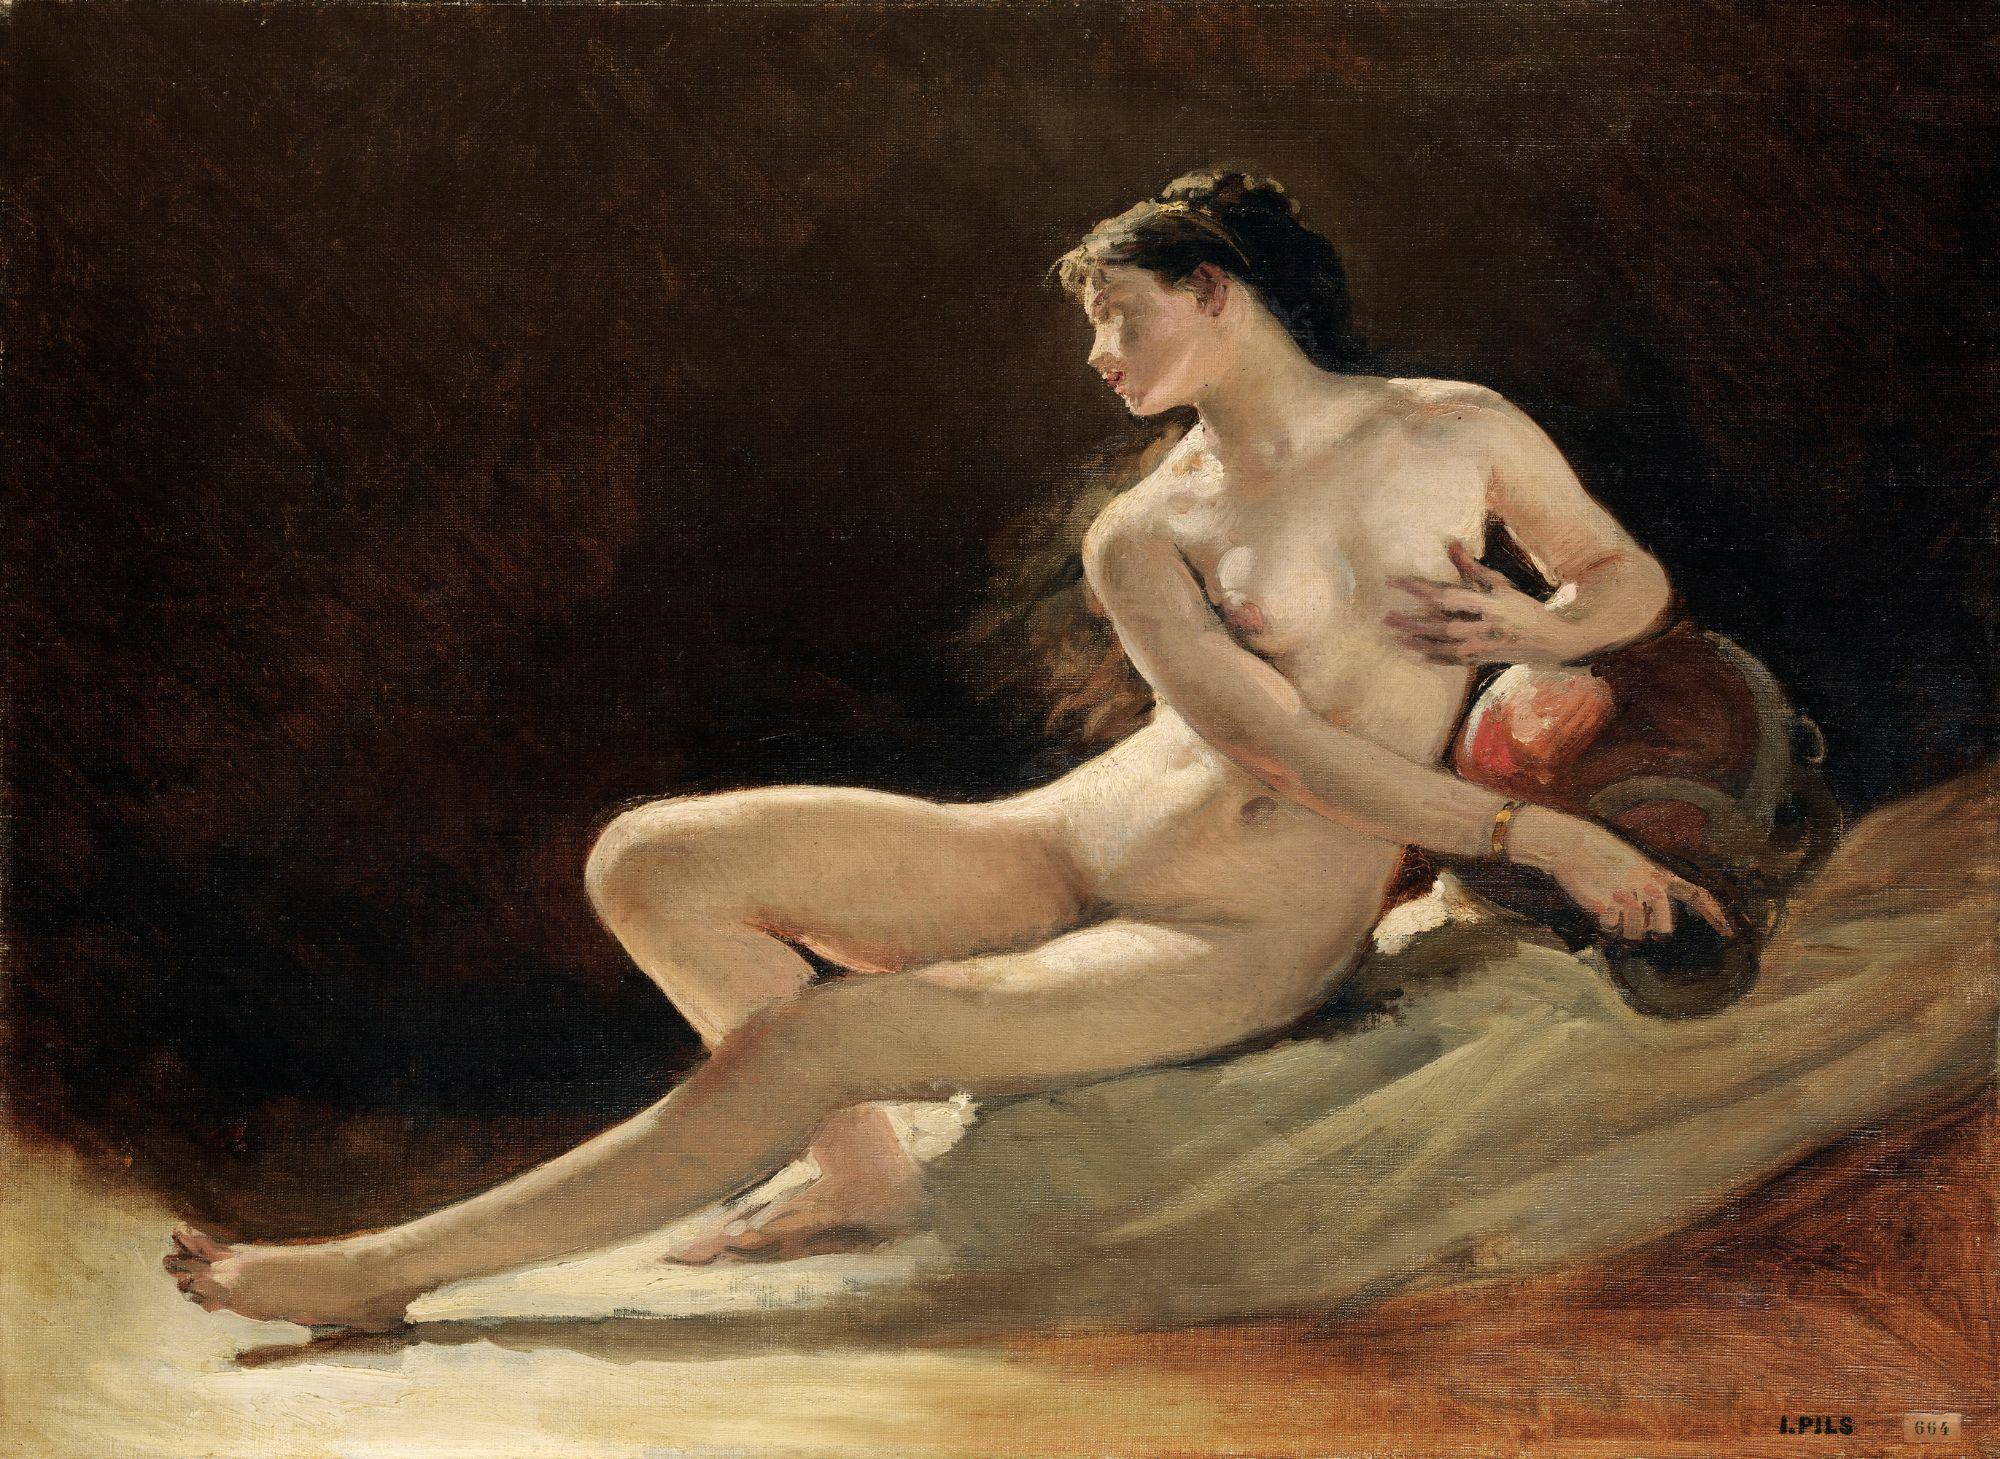 Isidore-Alexandre-Augustin Pils, 1813-1875. Аллегория Сены (этюд). 53 х 62 см.